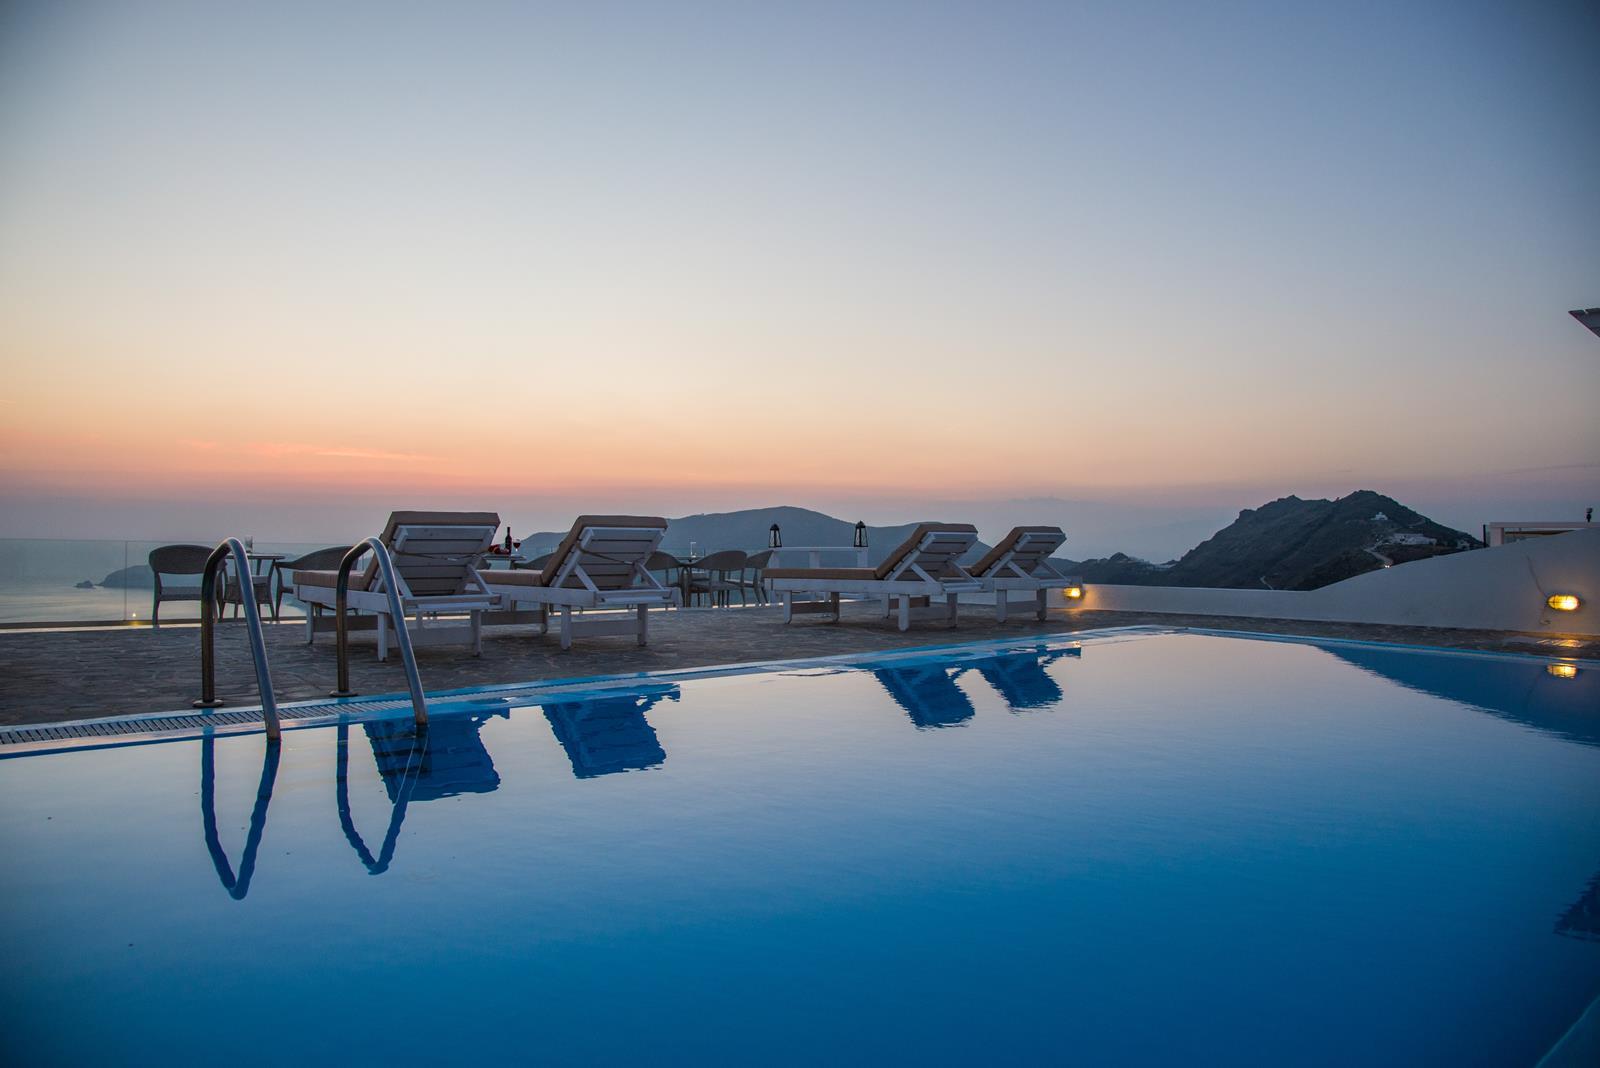 santorini hotels - Gizis Exclusive Santorini Greece